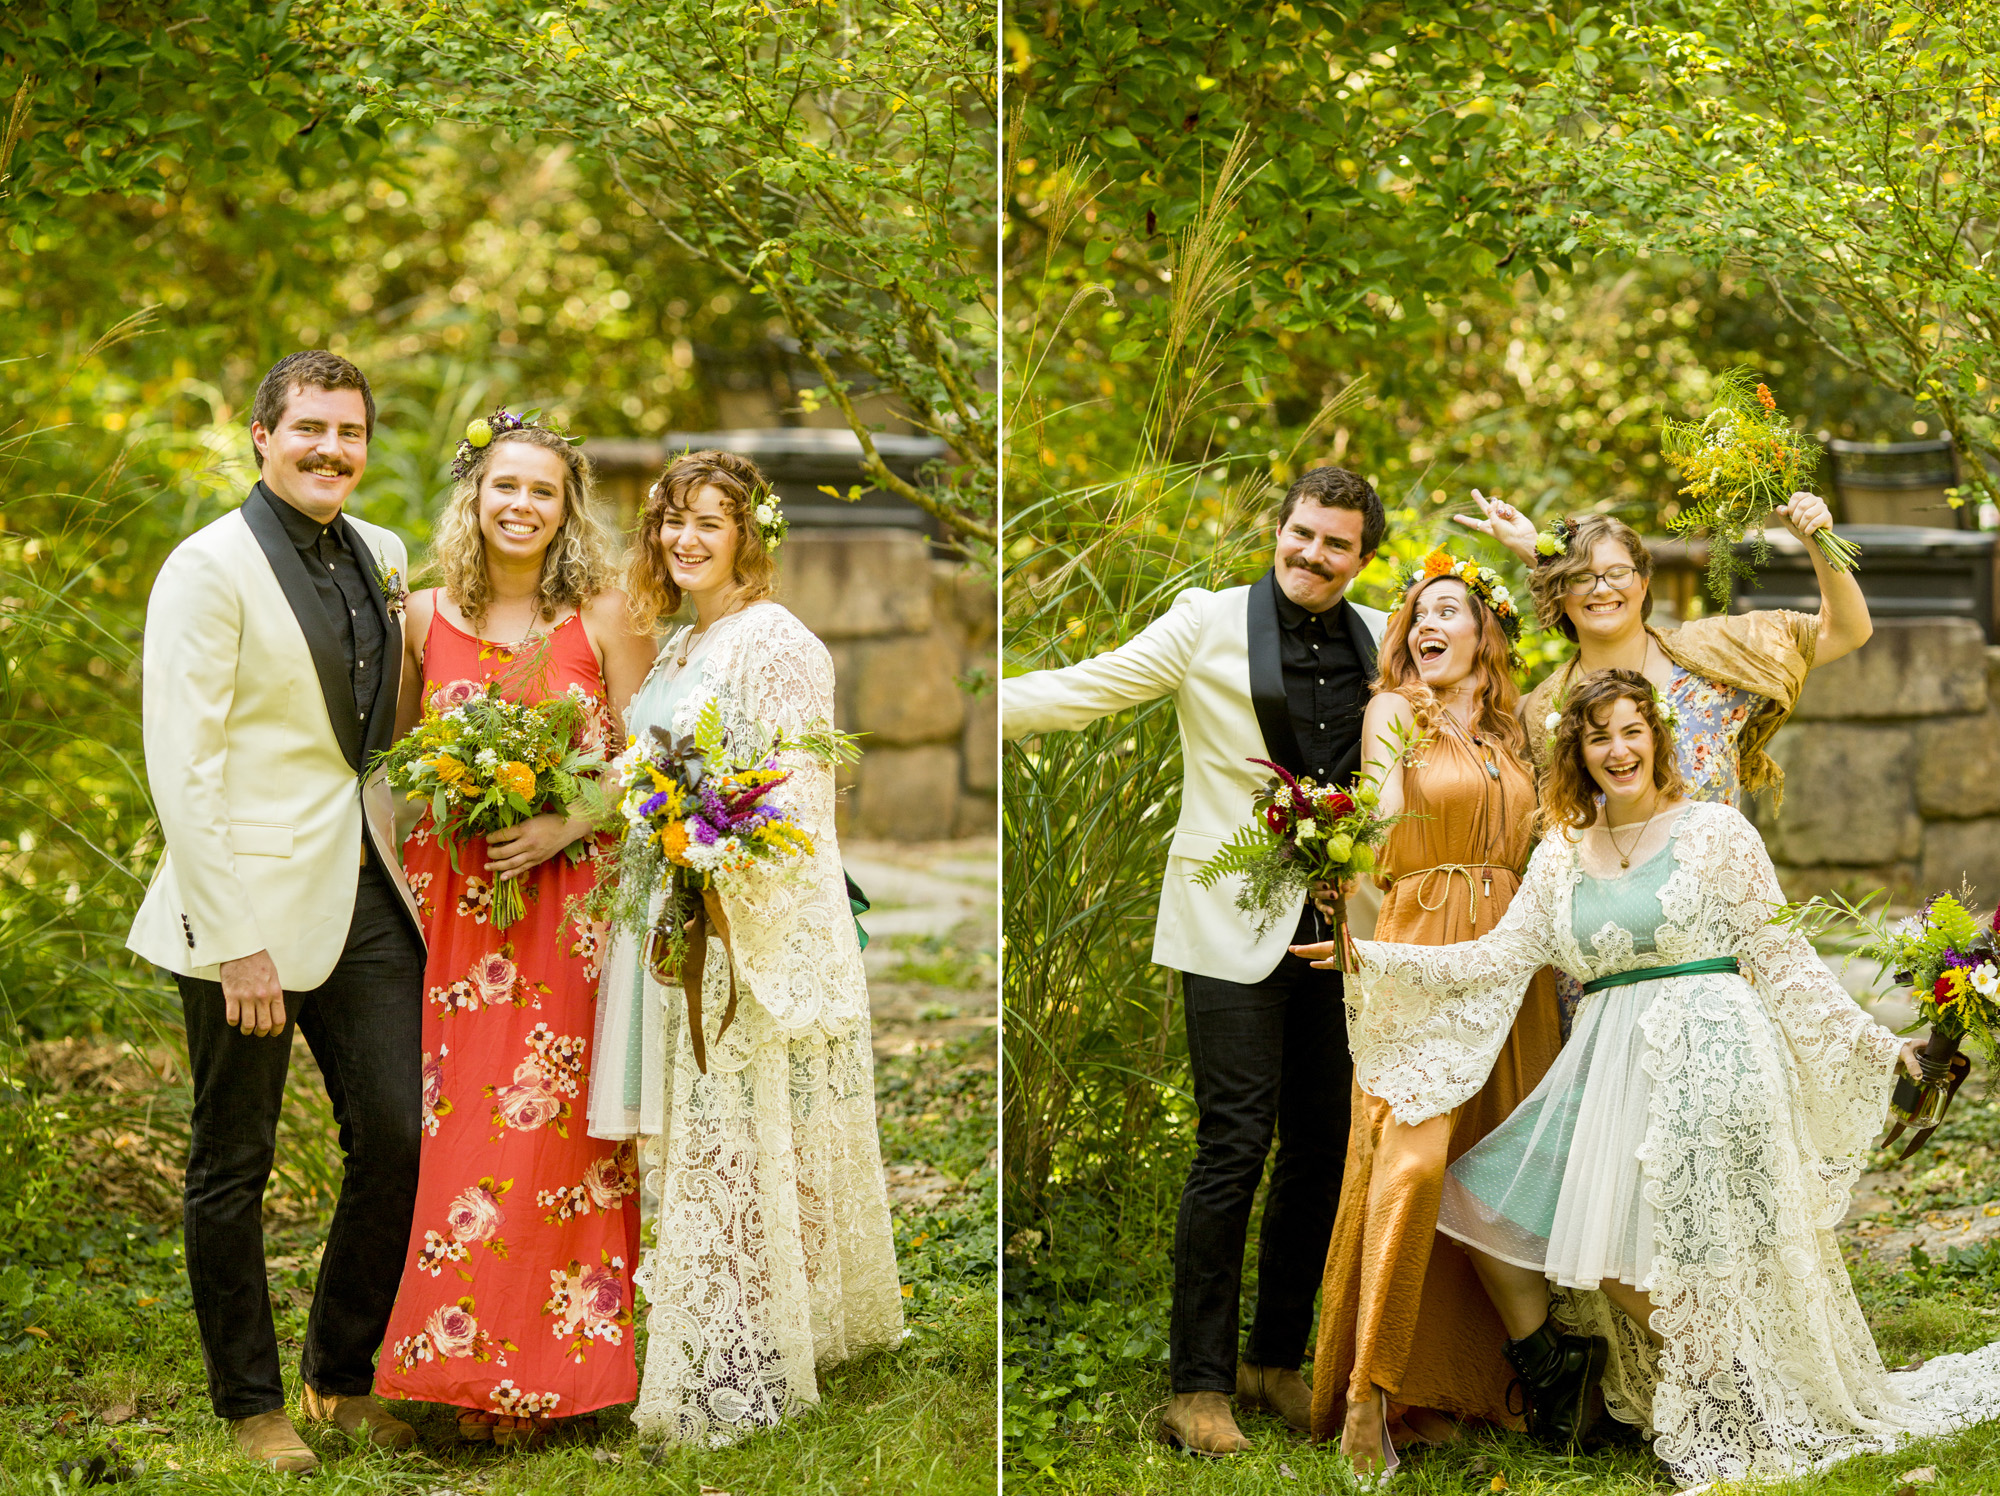 Seriously_Sabrina_Photography_Red_River_Gorge_Kentucky_Wedding_ShawnDana92.jpg